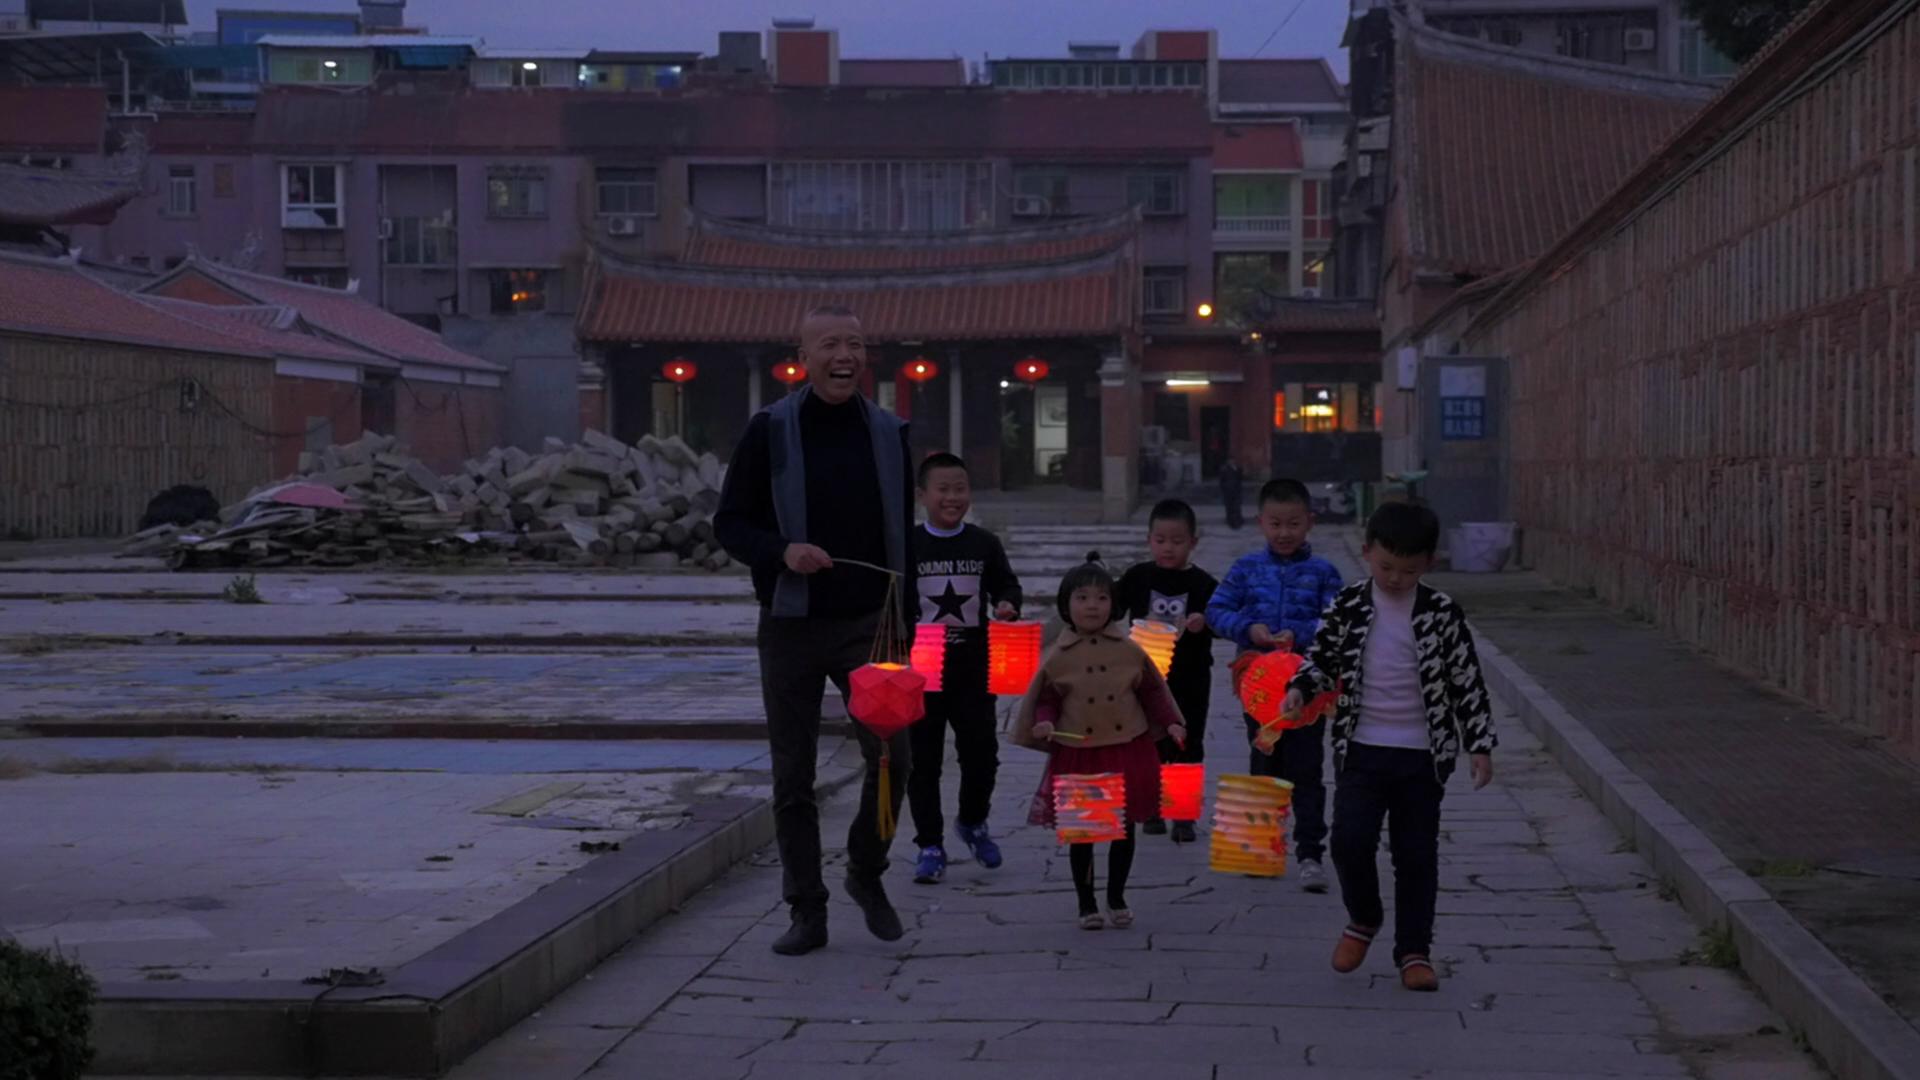 Cai Guo-Qiang with children and lanterns in Quanzhou, China